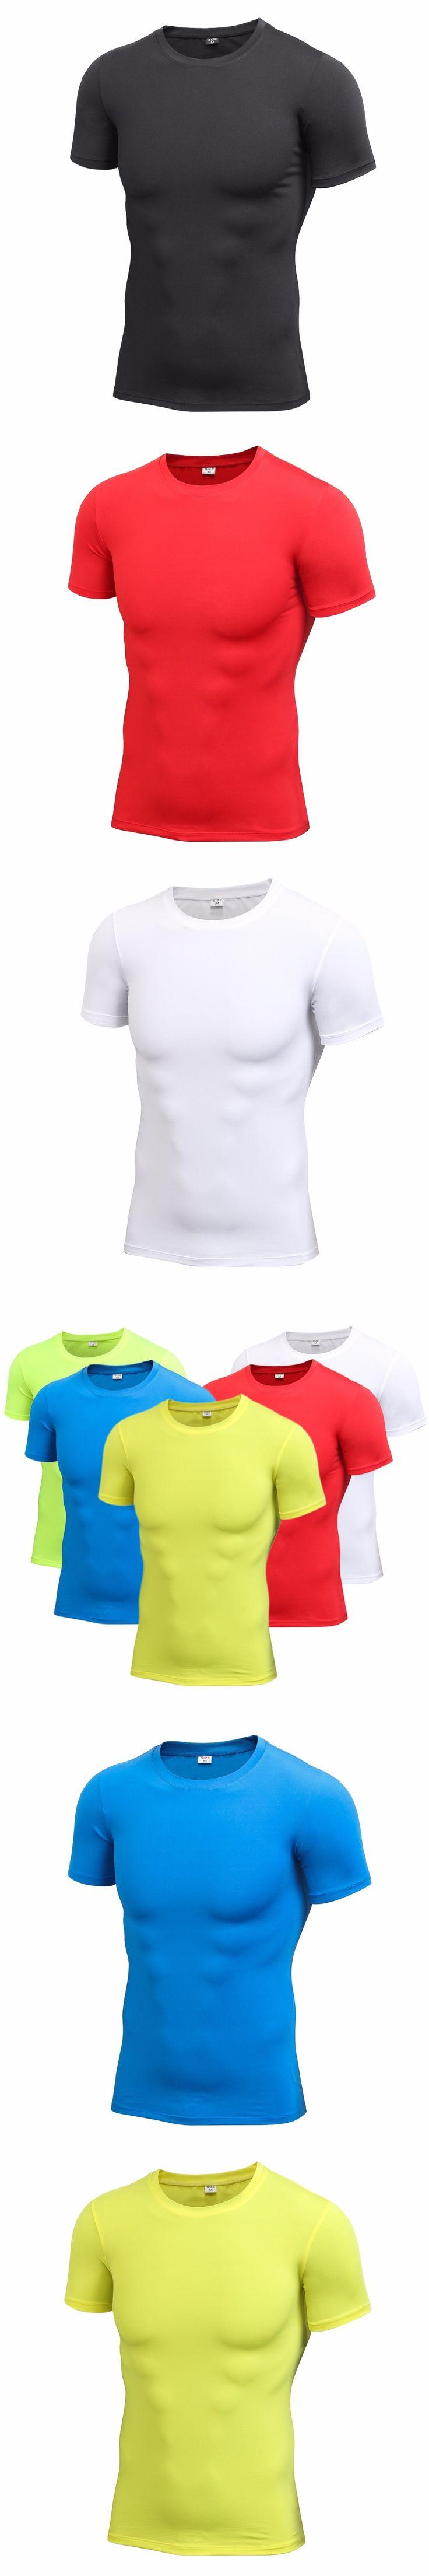 Men Elastic Compression  T-shirt Men's Tight Round Collar Shirt Tops Short Sleeved Cloth